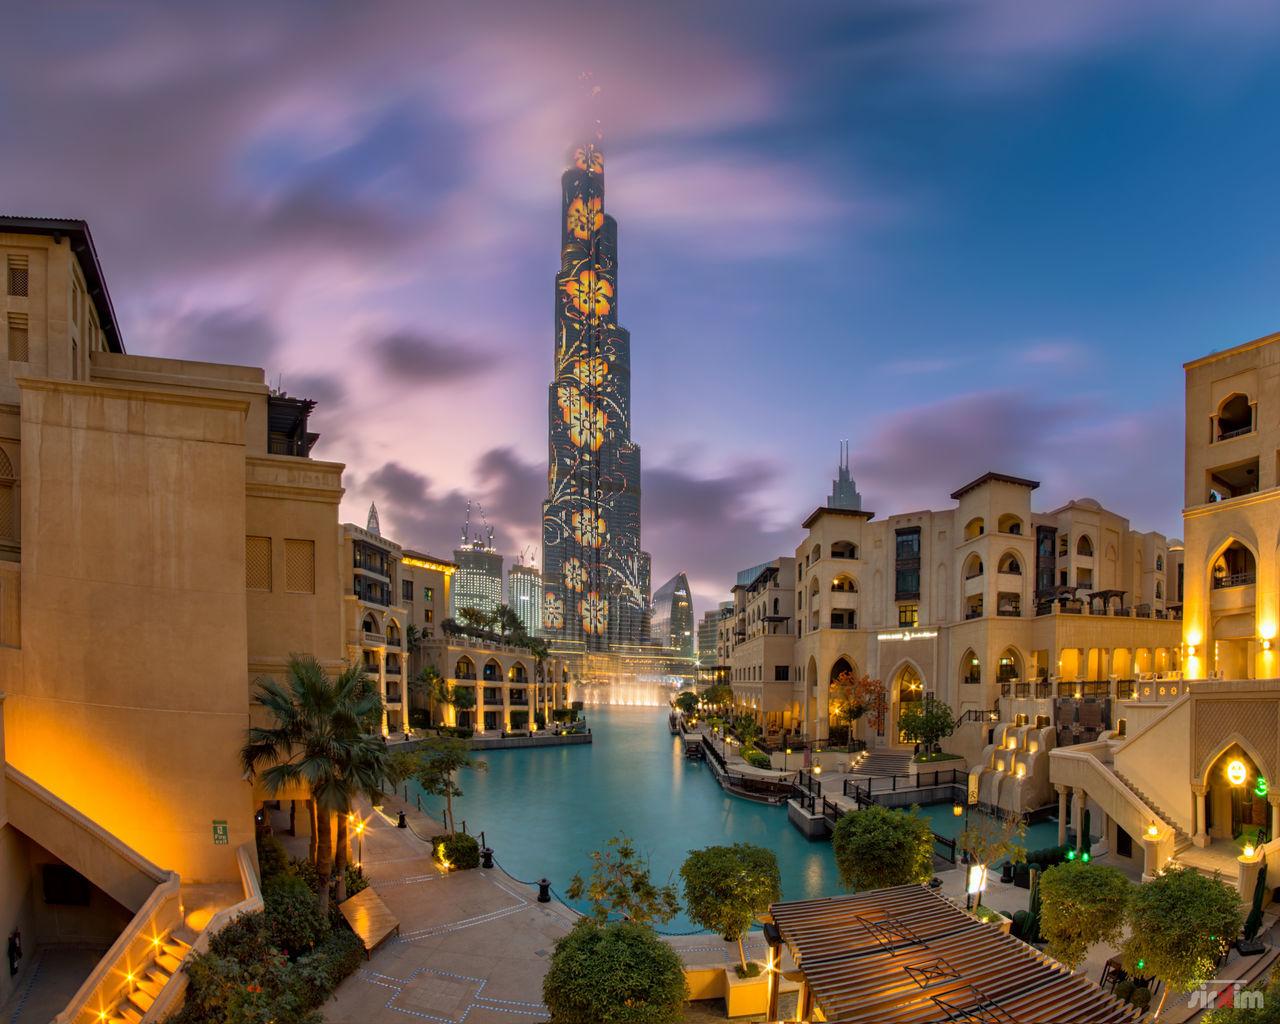 The Beanstalk Cityscape Travel Destinations The Architect - 2017 EyeEm Awards Sky City Dubai DXB Middleeast Sunset Dubai Burj Khalifa, Dubai Souq Al Bahar Downtown Dubai Wanderlust